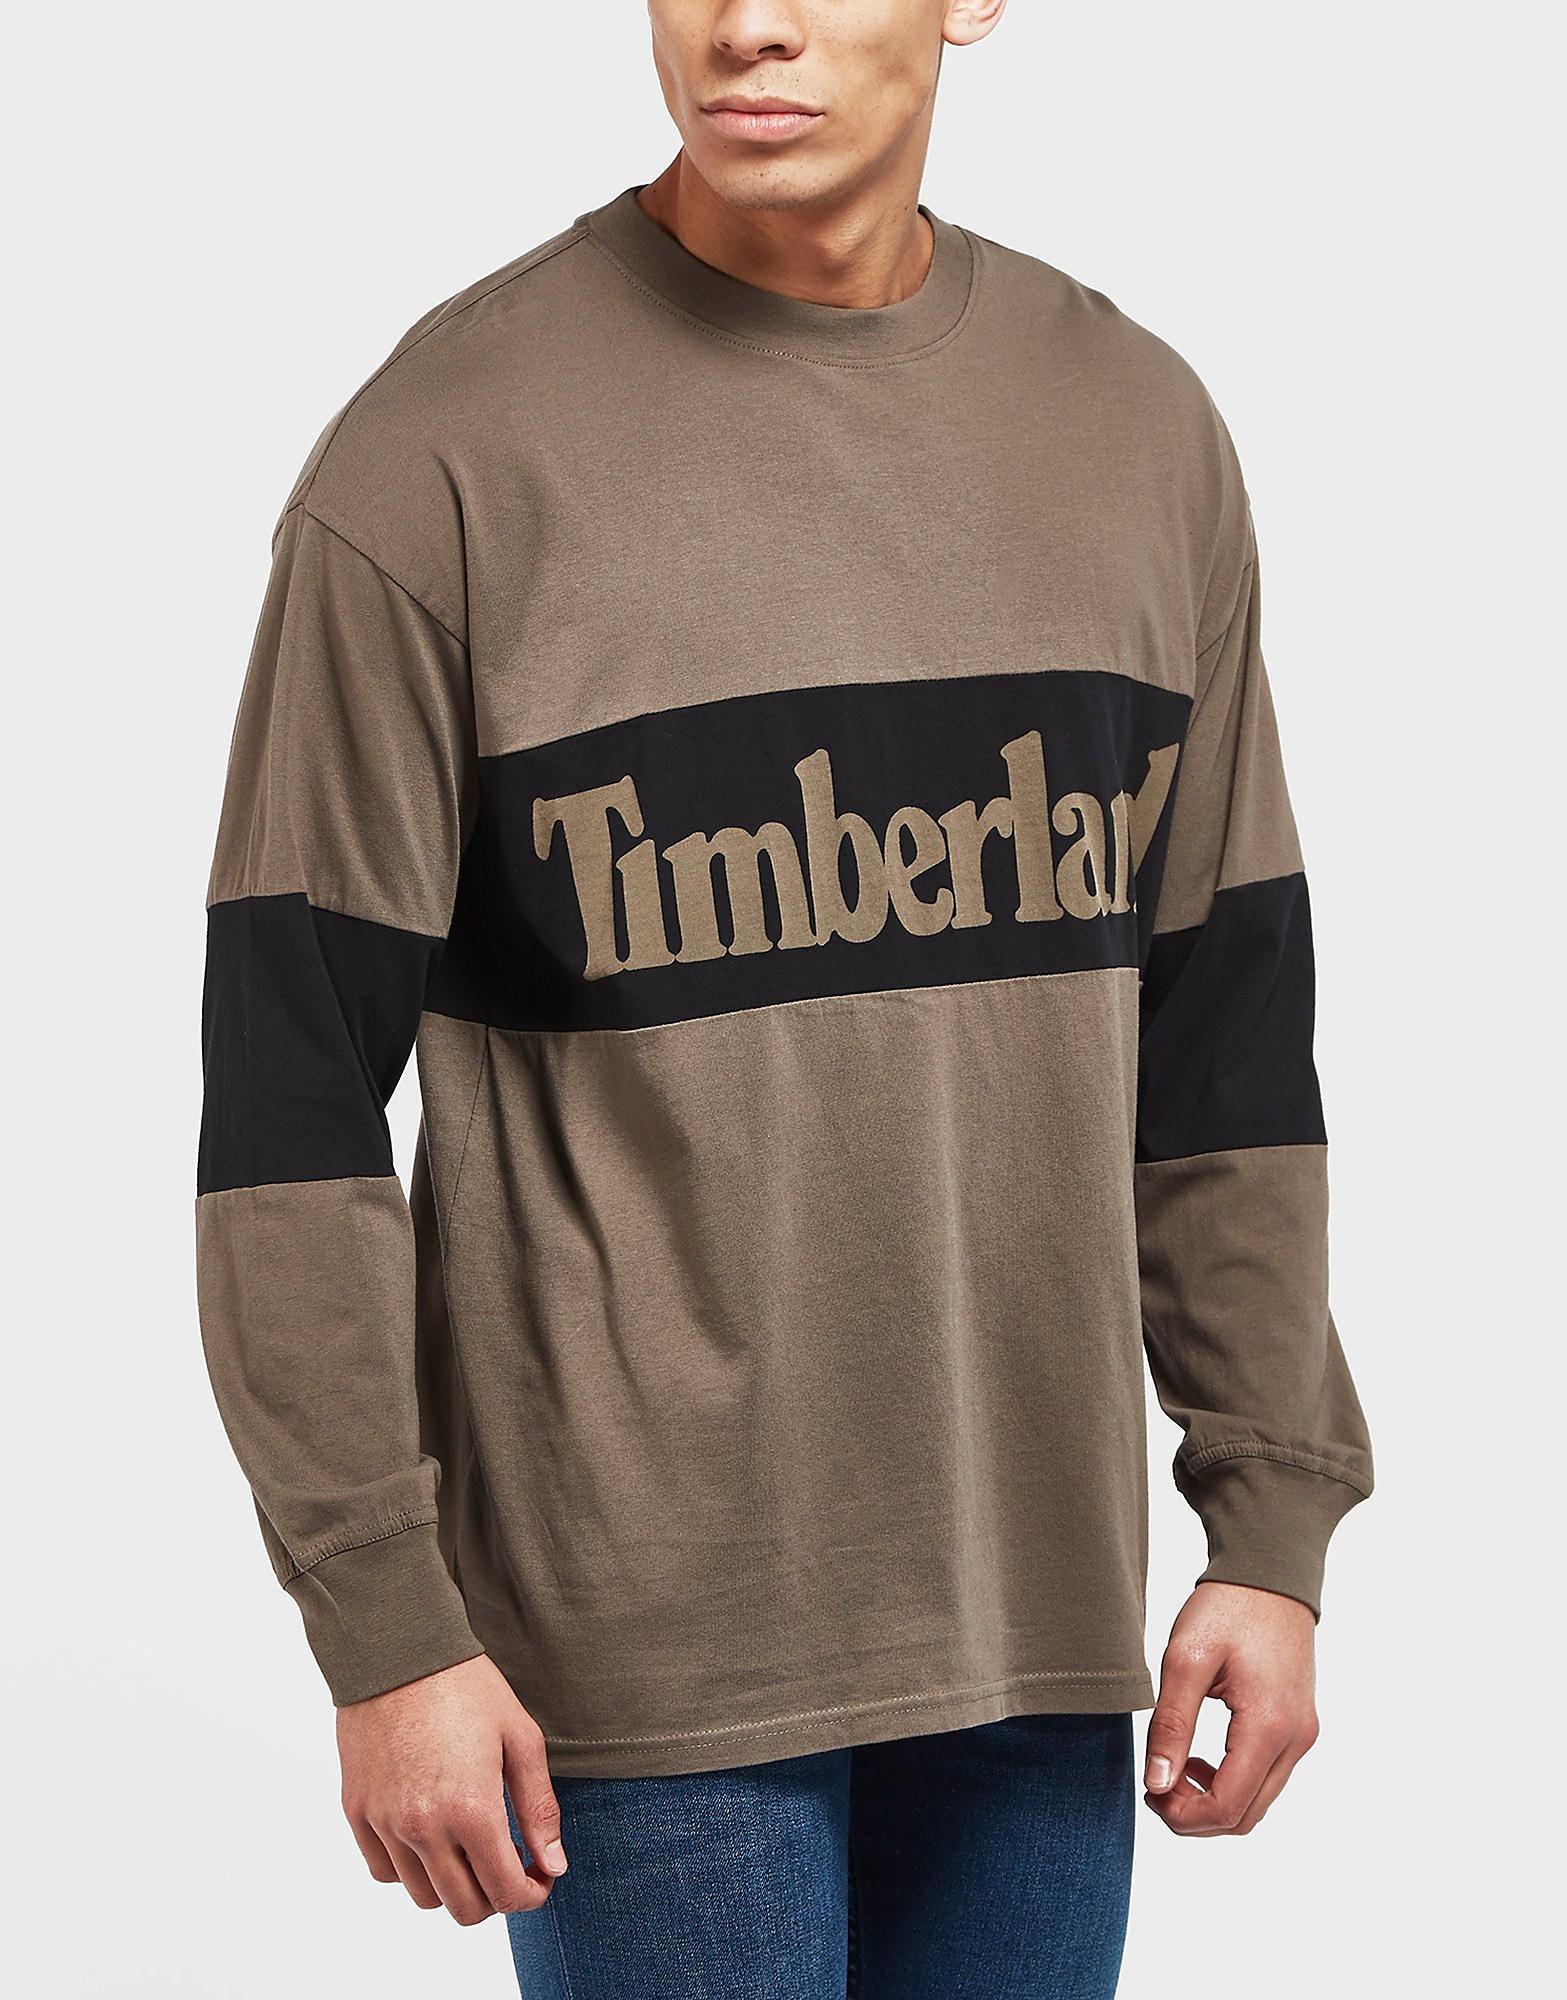 Timberland Chest Panel Long Sleeve T-Shirt